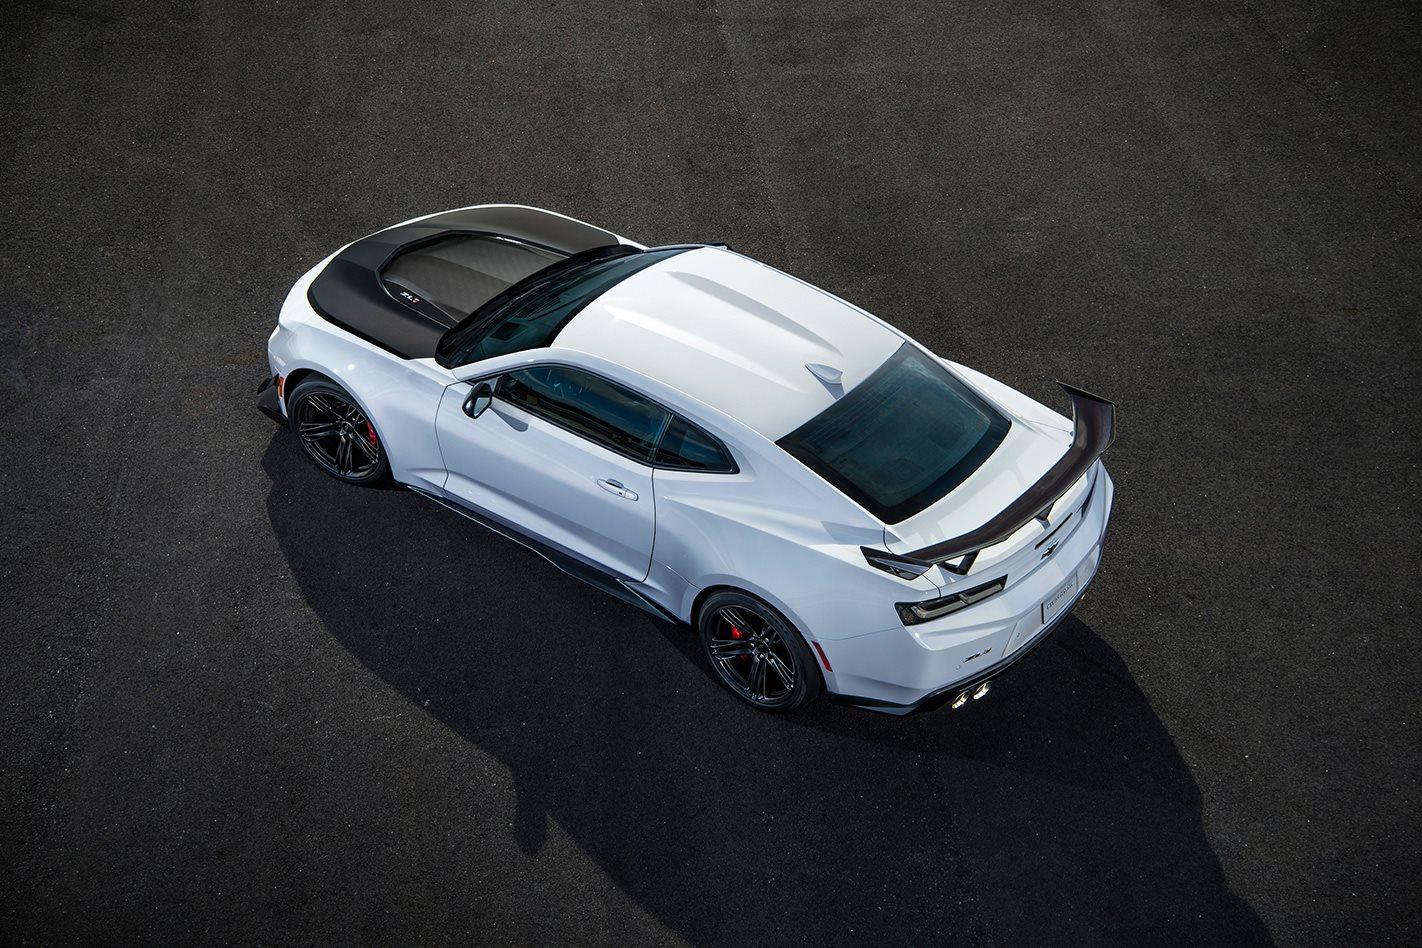 2018-Chevrolet-Camaro-ZL1-1LE-aerial.jpg